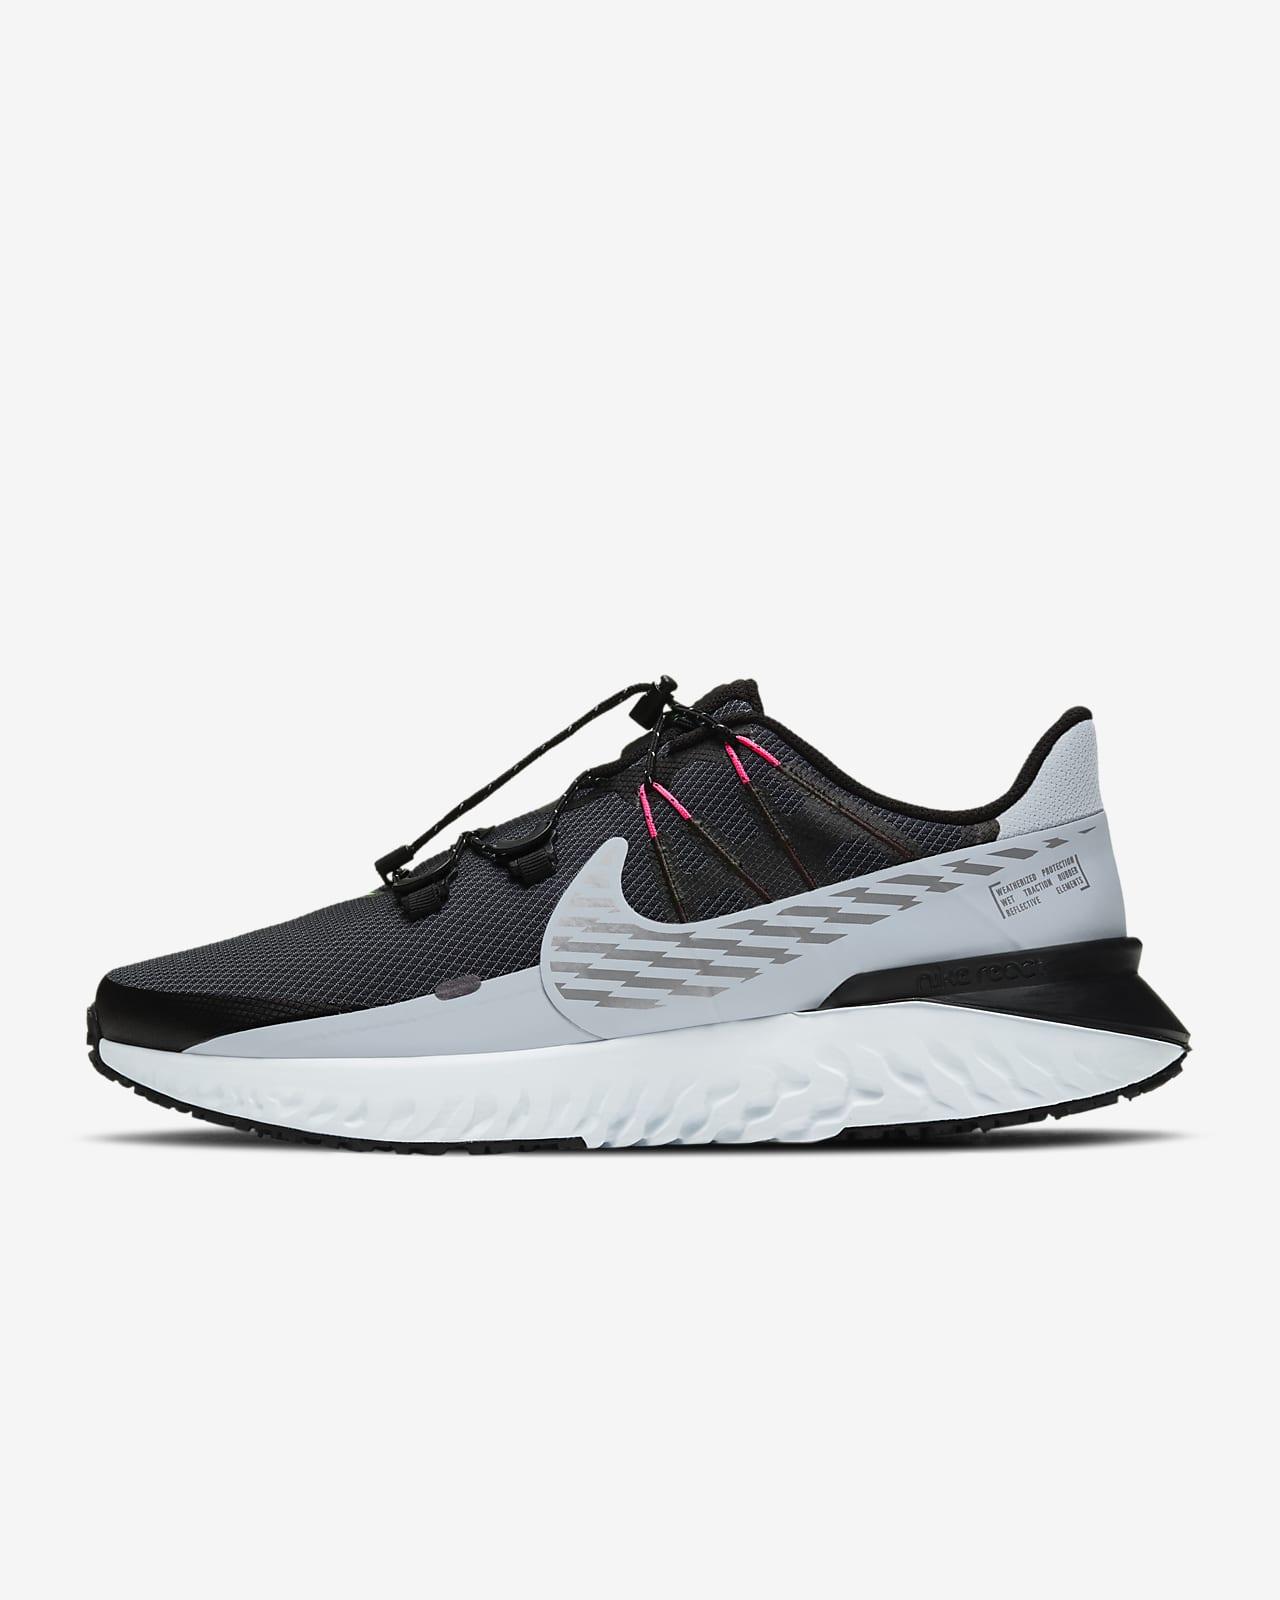 Sapatilhas de running Nike Legend React 3 Shield para homem